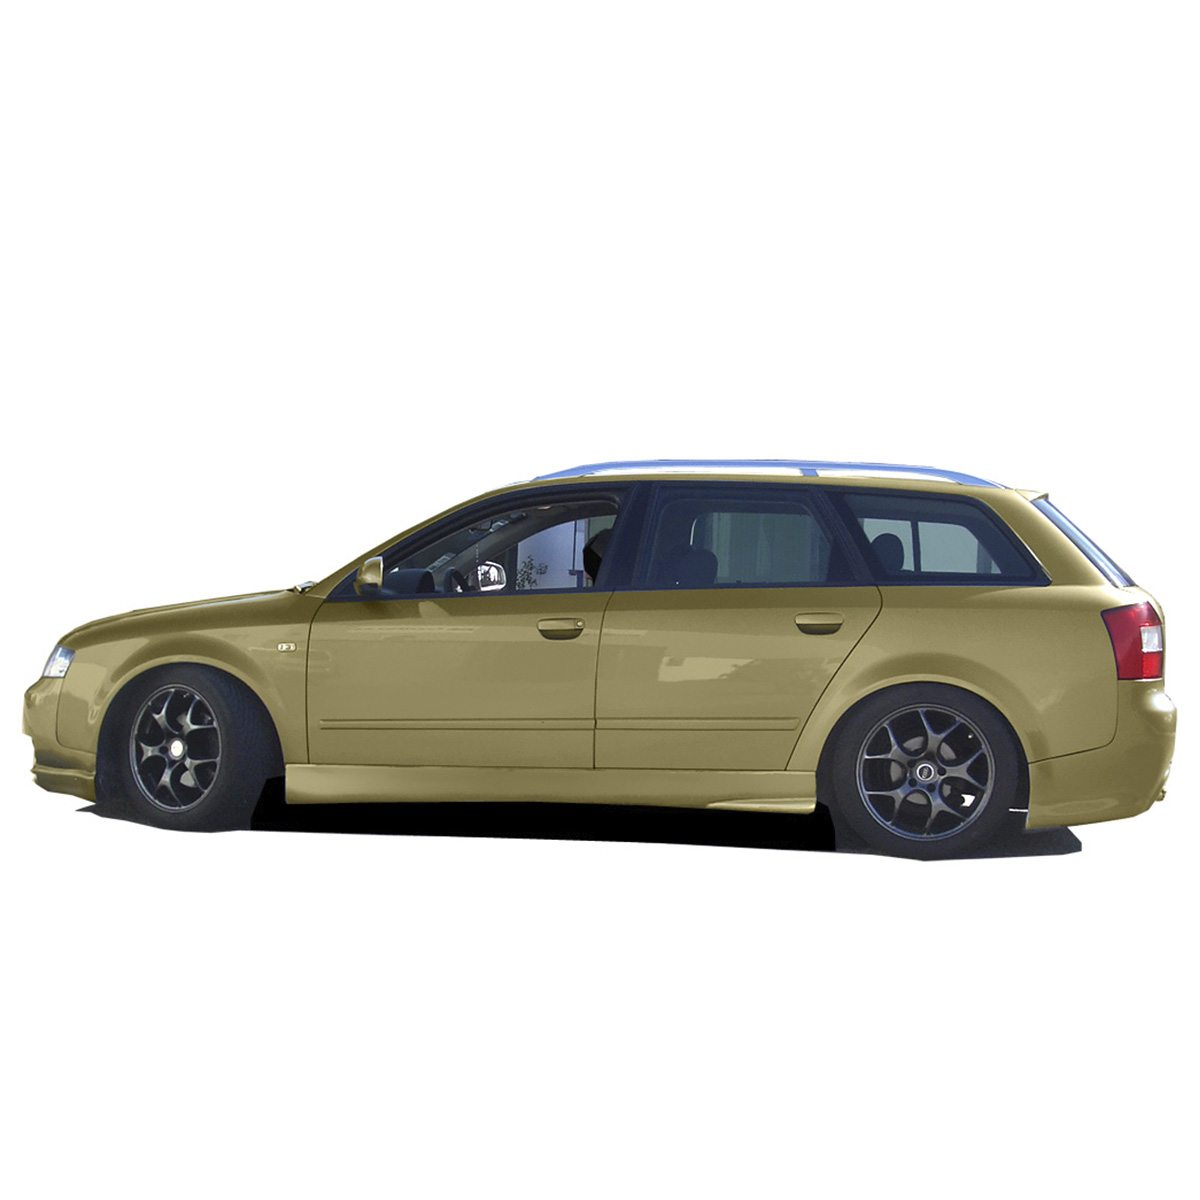 Audi-A4-2004-Sport-VAN-Emb-UNIV-EBU0465